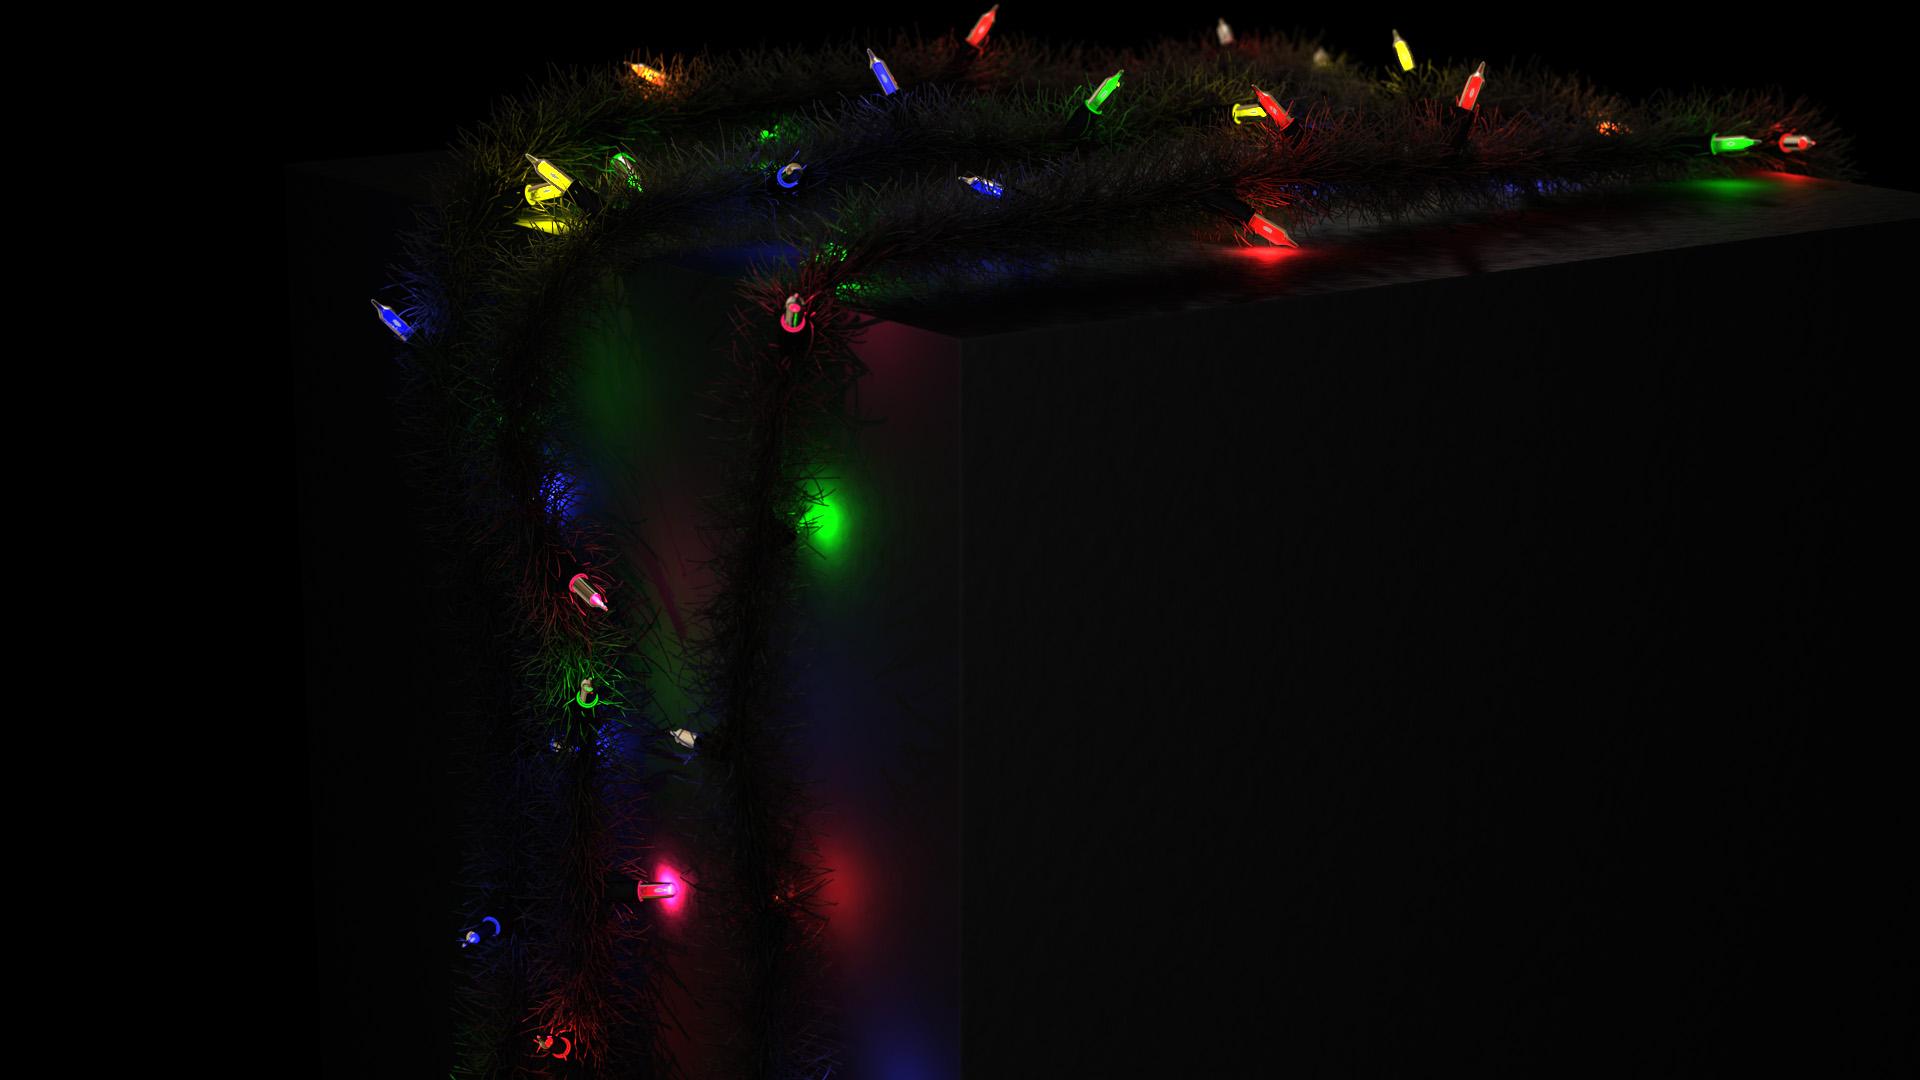 Christmas wreath with lights garland homemade creative handmade